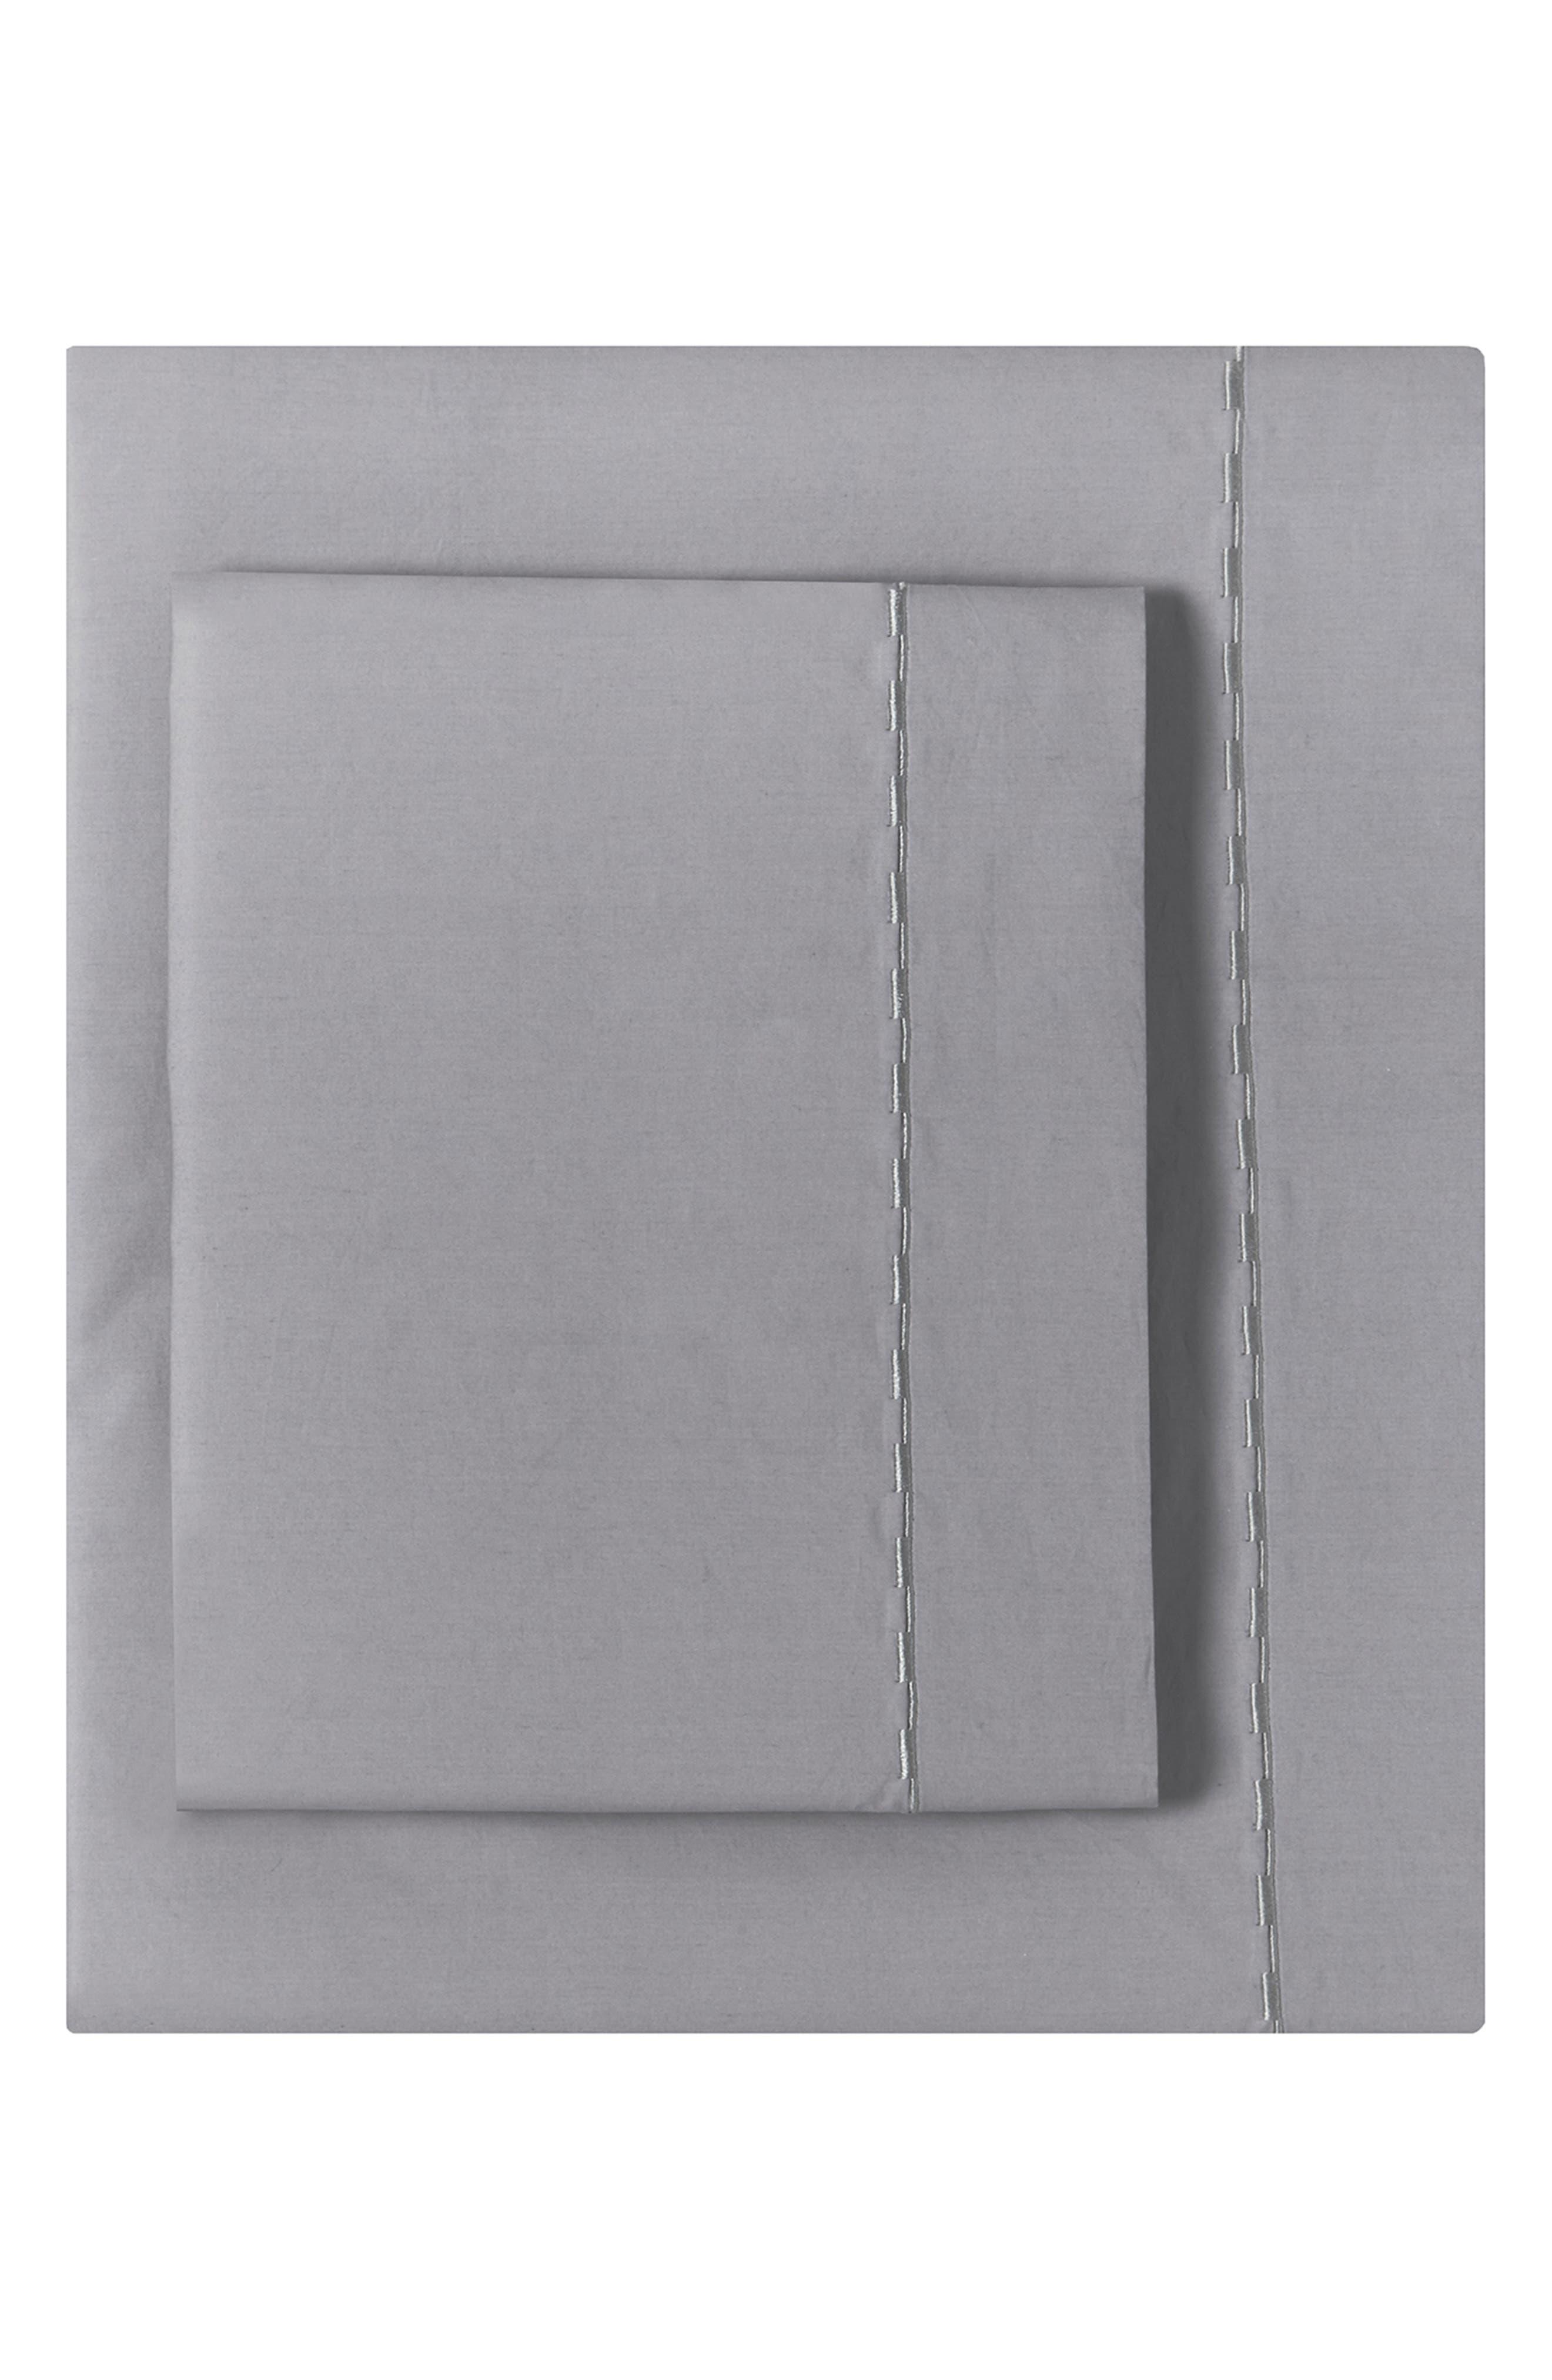 Cotton Percale Sheet Set, Main, color, GREY-BLUE